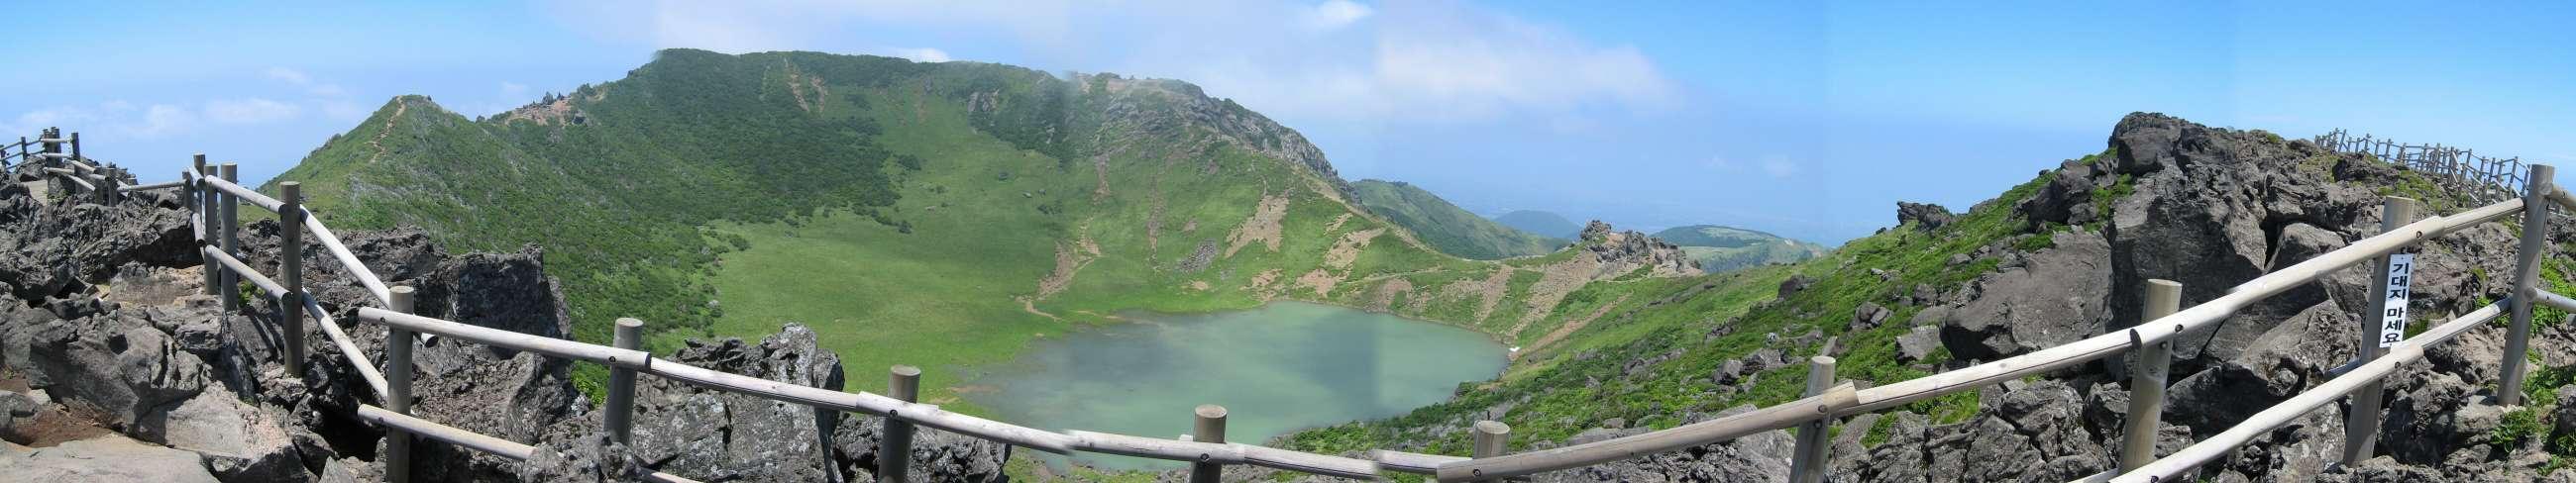 coreasur_paeng-nok-dam